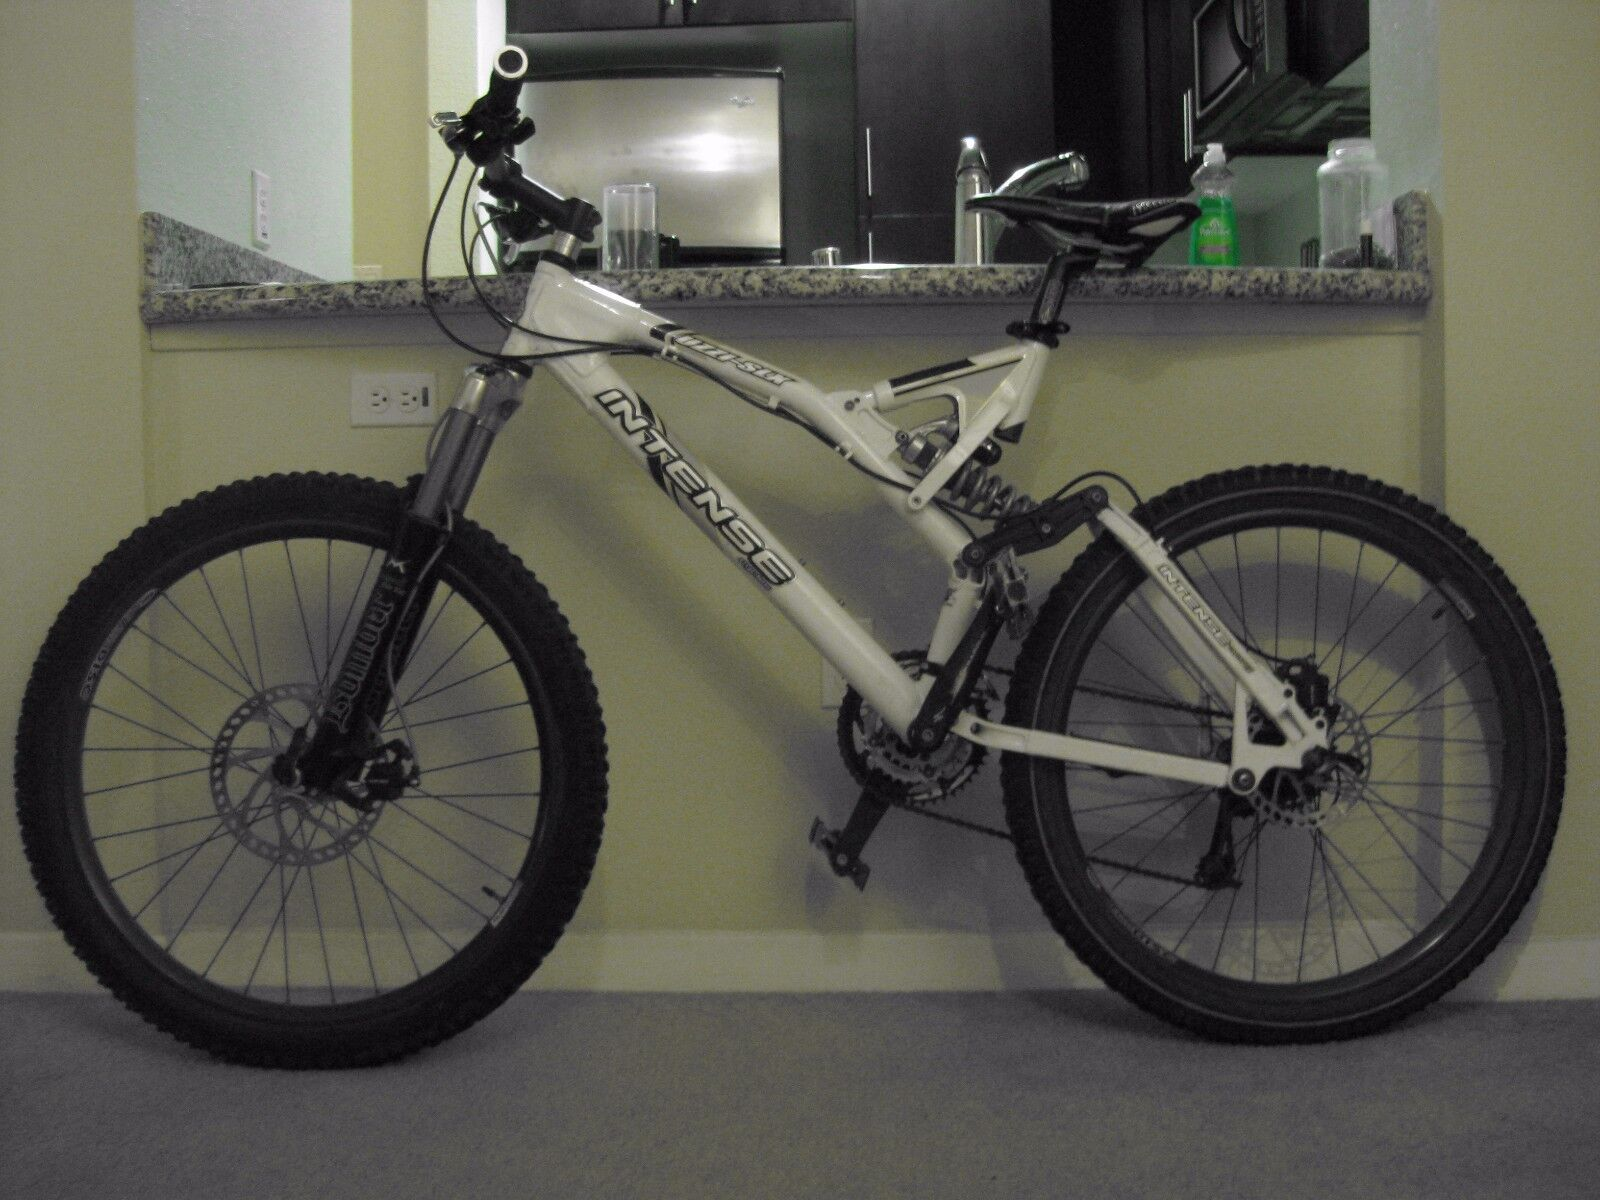 2004 Intense UZI SLX Freeride Mountain Bike